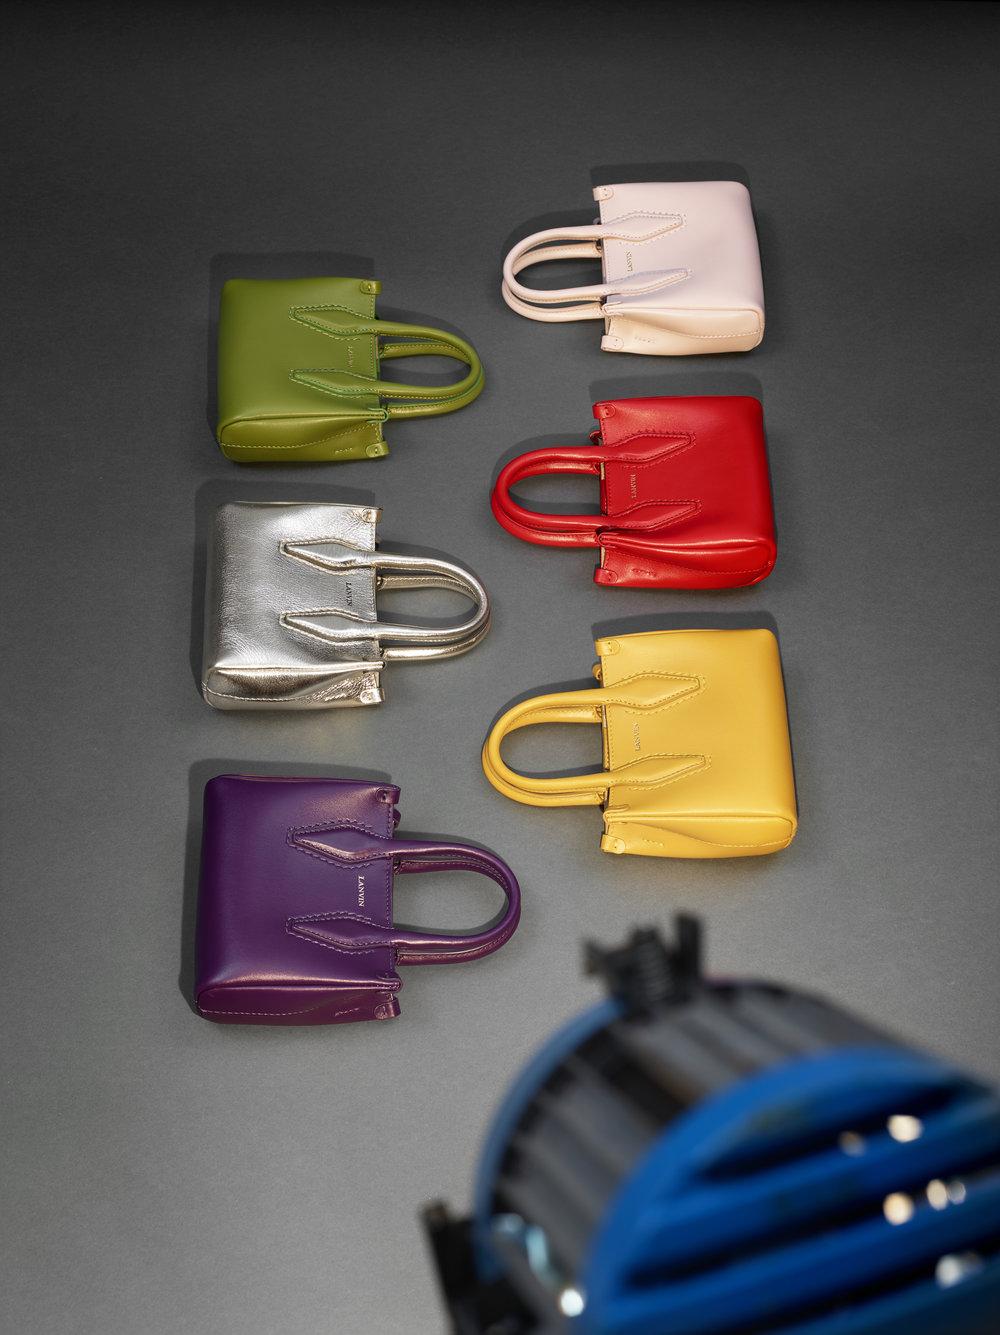 Lanvin Bags lying X Shot1.jpg